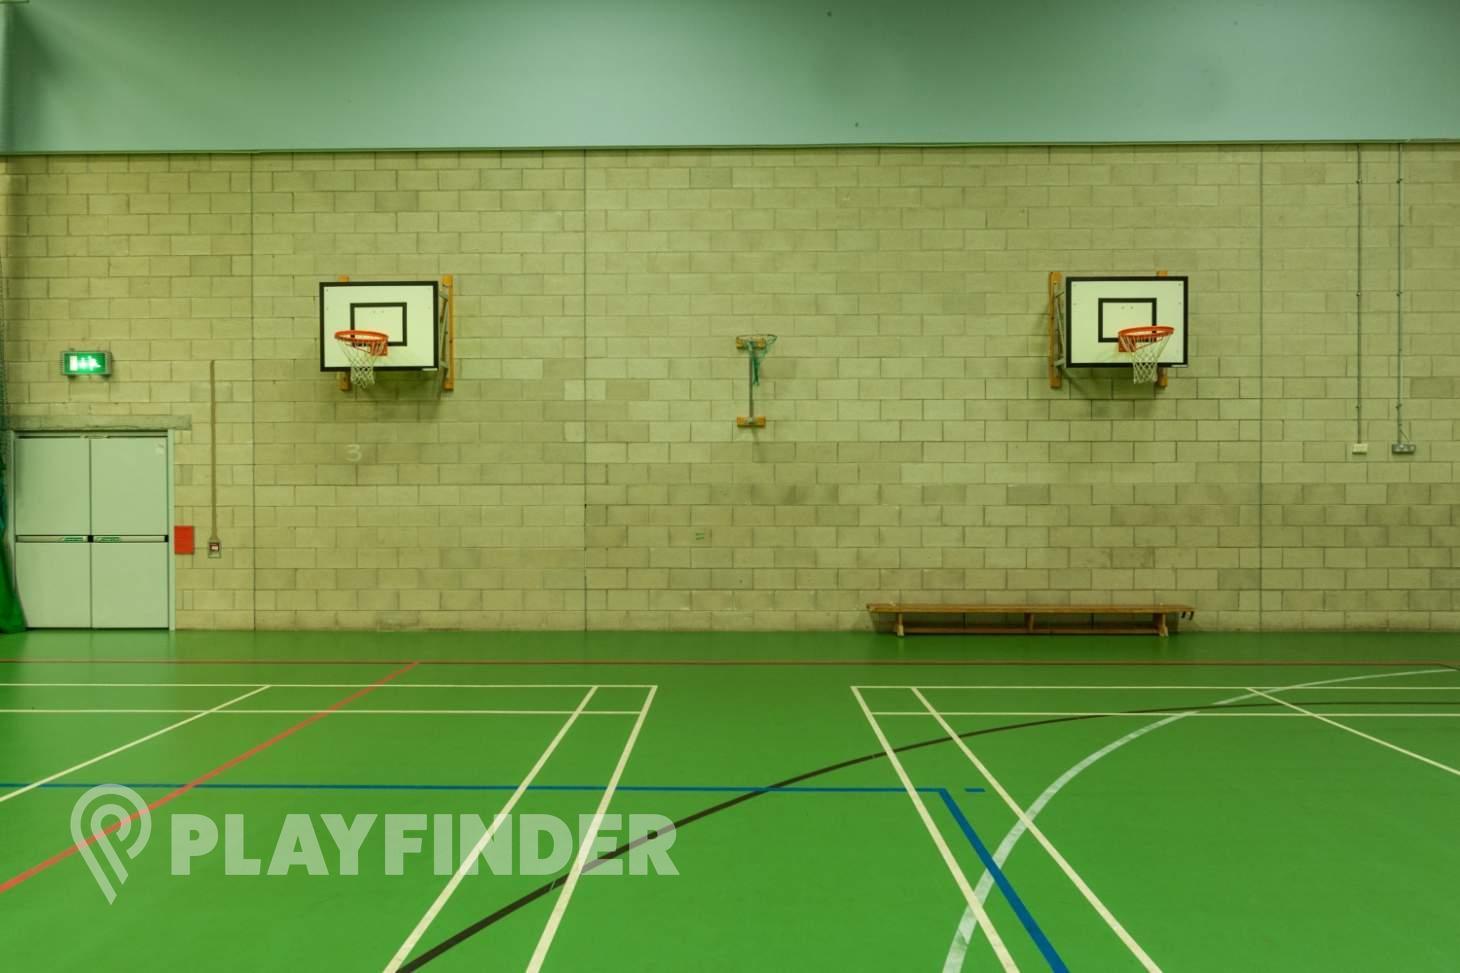 Chorlton High School Indoor basketball court